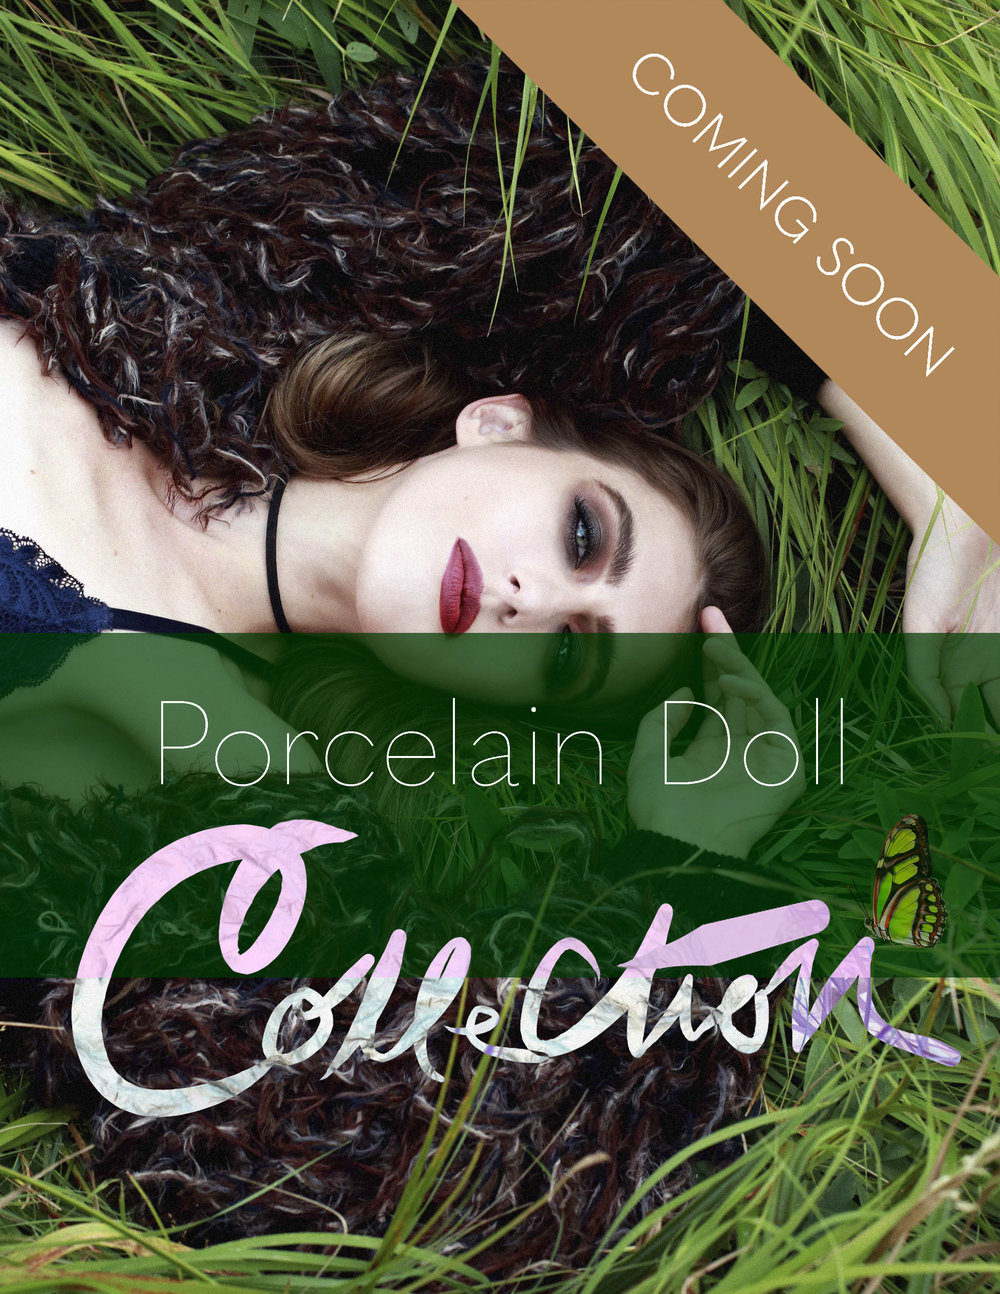 Porcelain Doll Collection Photoshop Actions - SHOP Photographer Alyssa Risley @alyssarisley